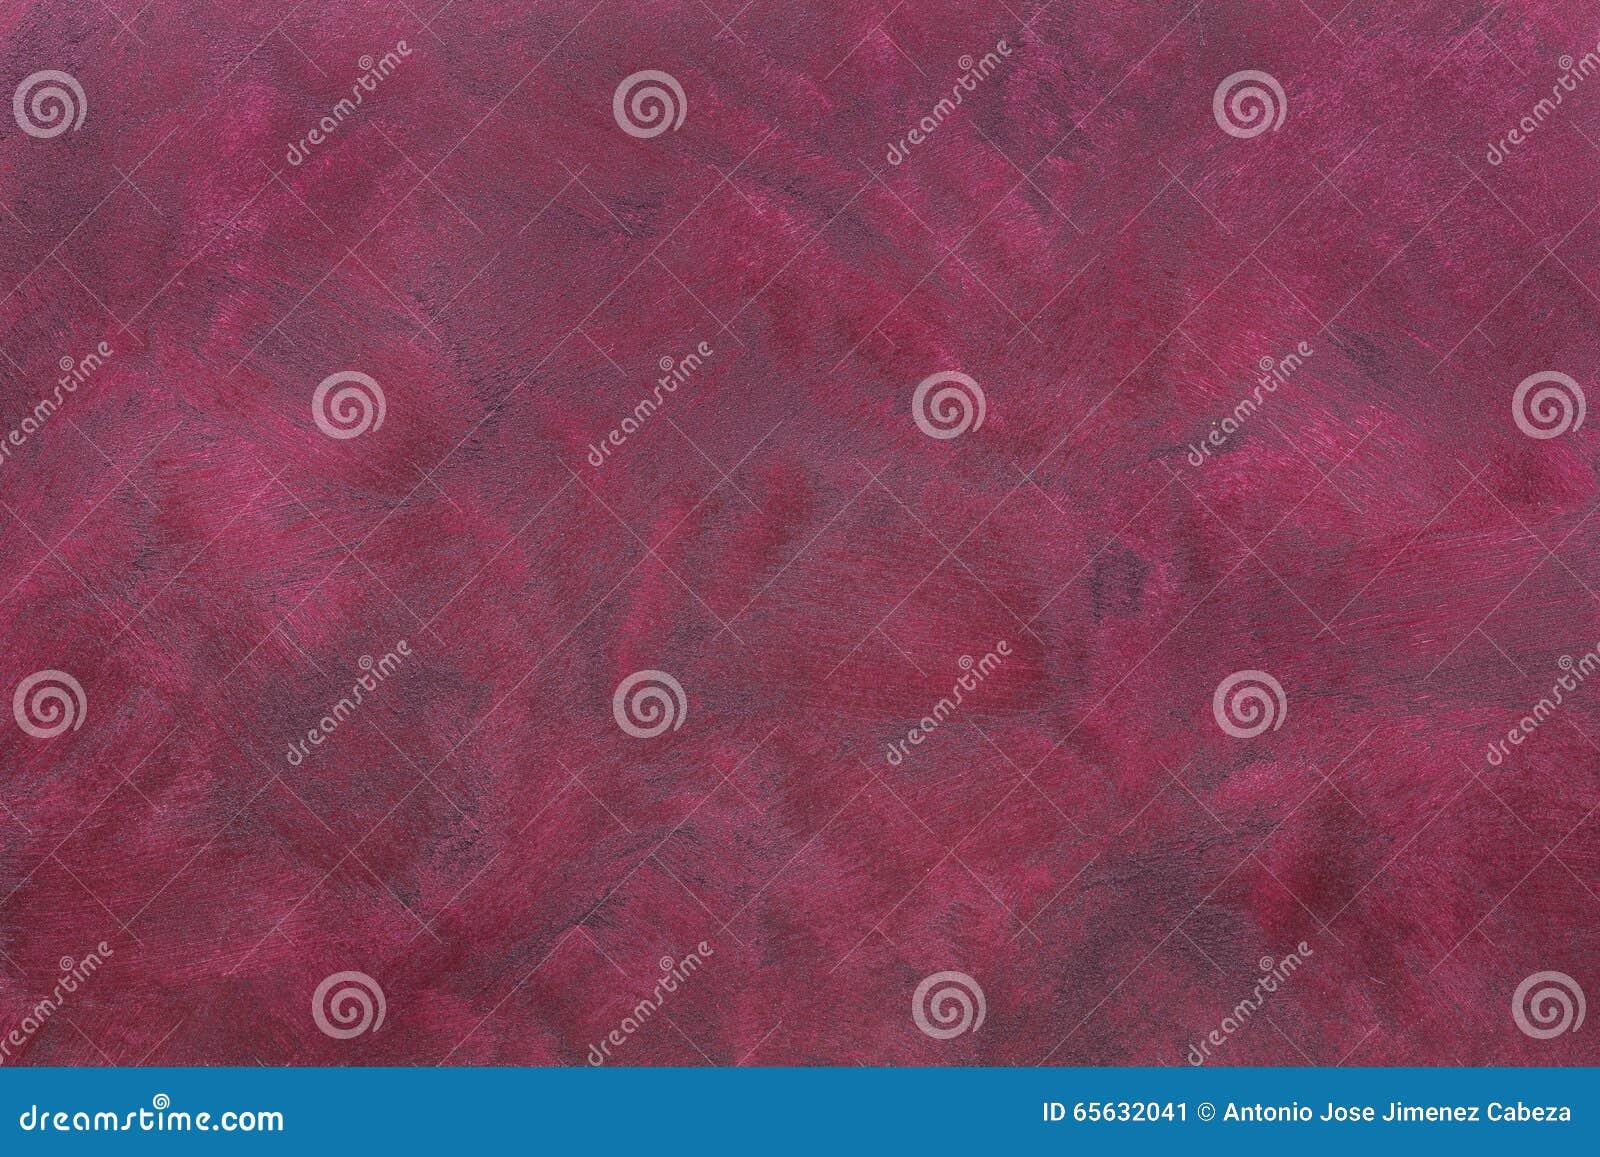 Mur texturisé de grunge pourpre et magenta